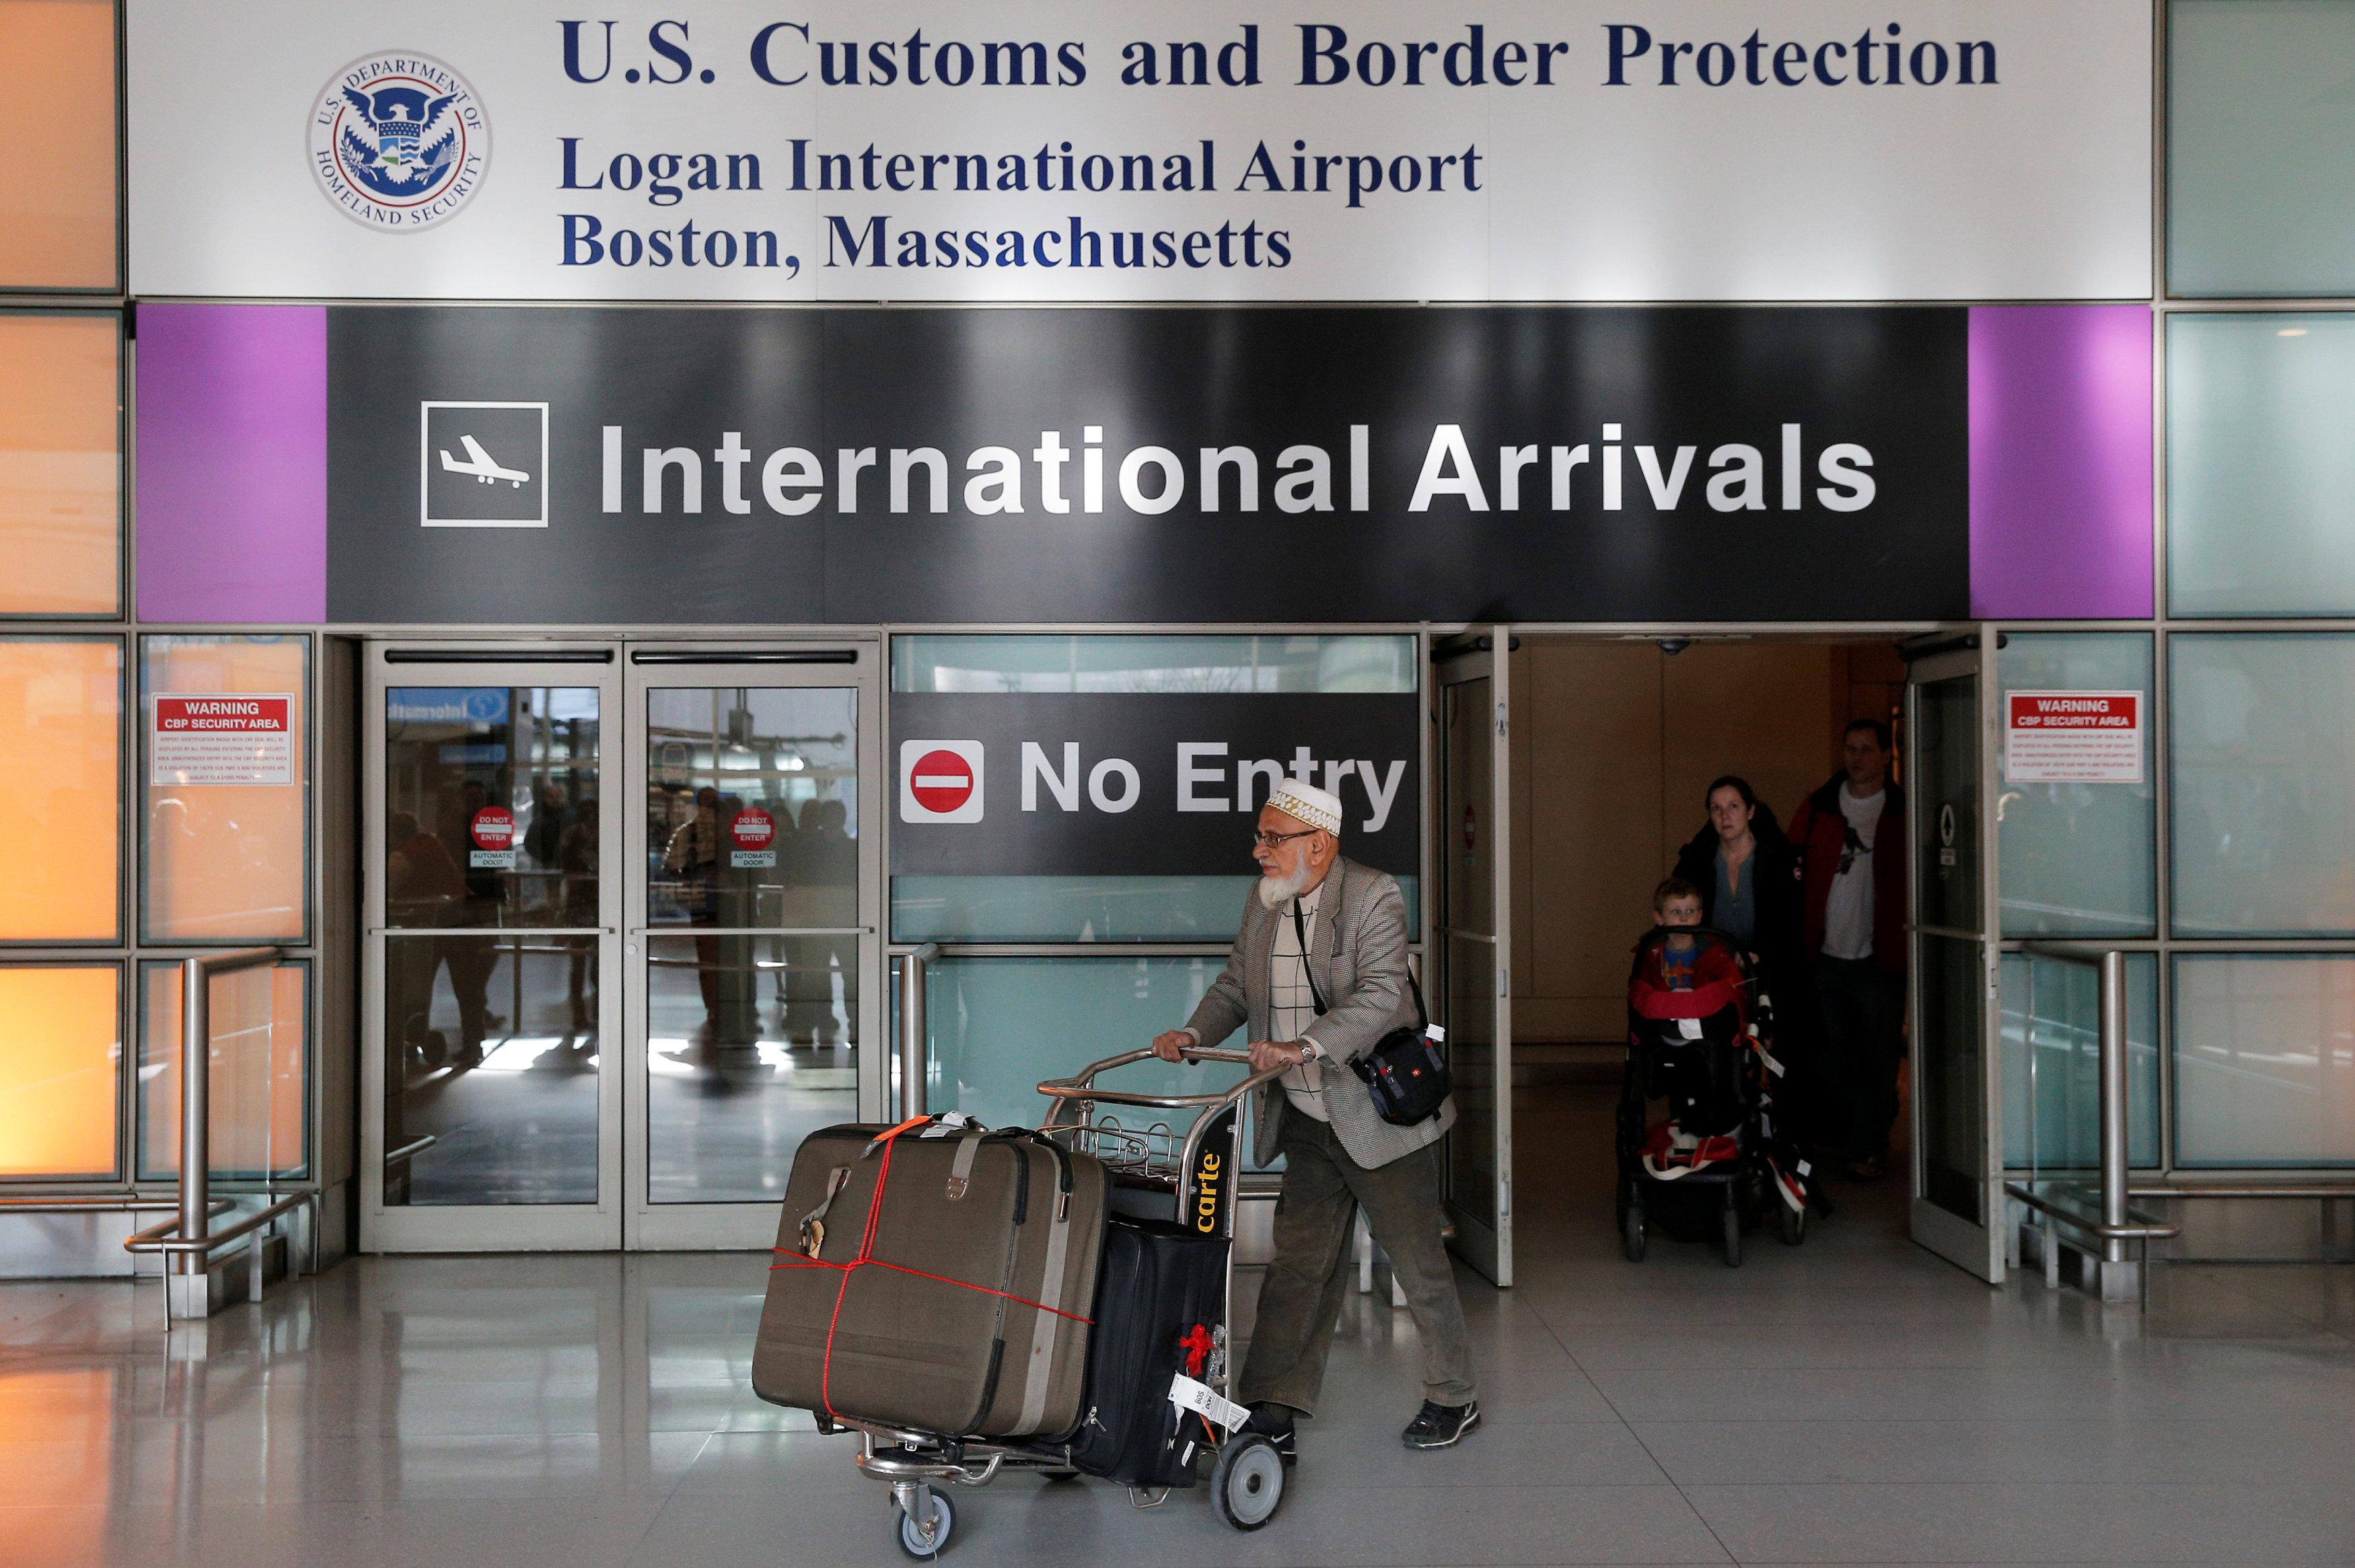 International travelers arrive after U.S. President Donald Trump's executive order travel ban at Logan Airport in Boston, Massachusetts, U.S